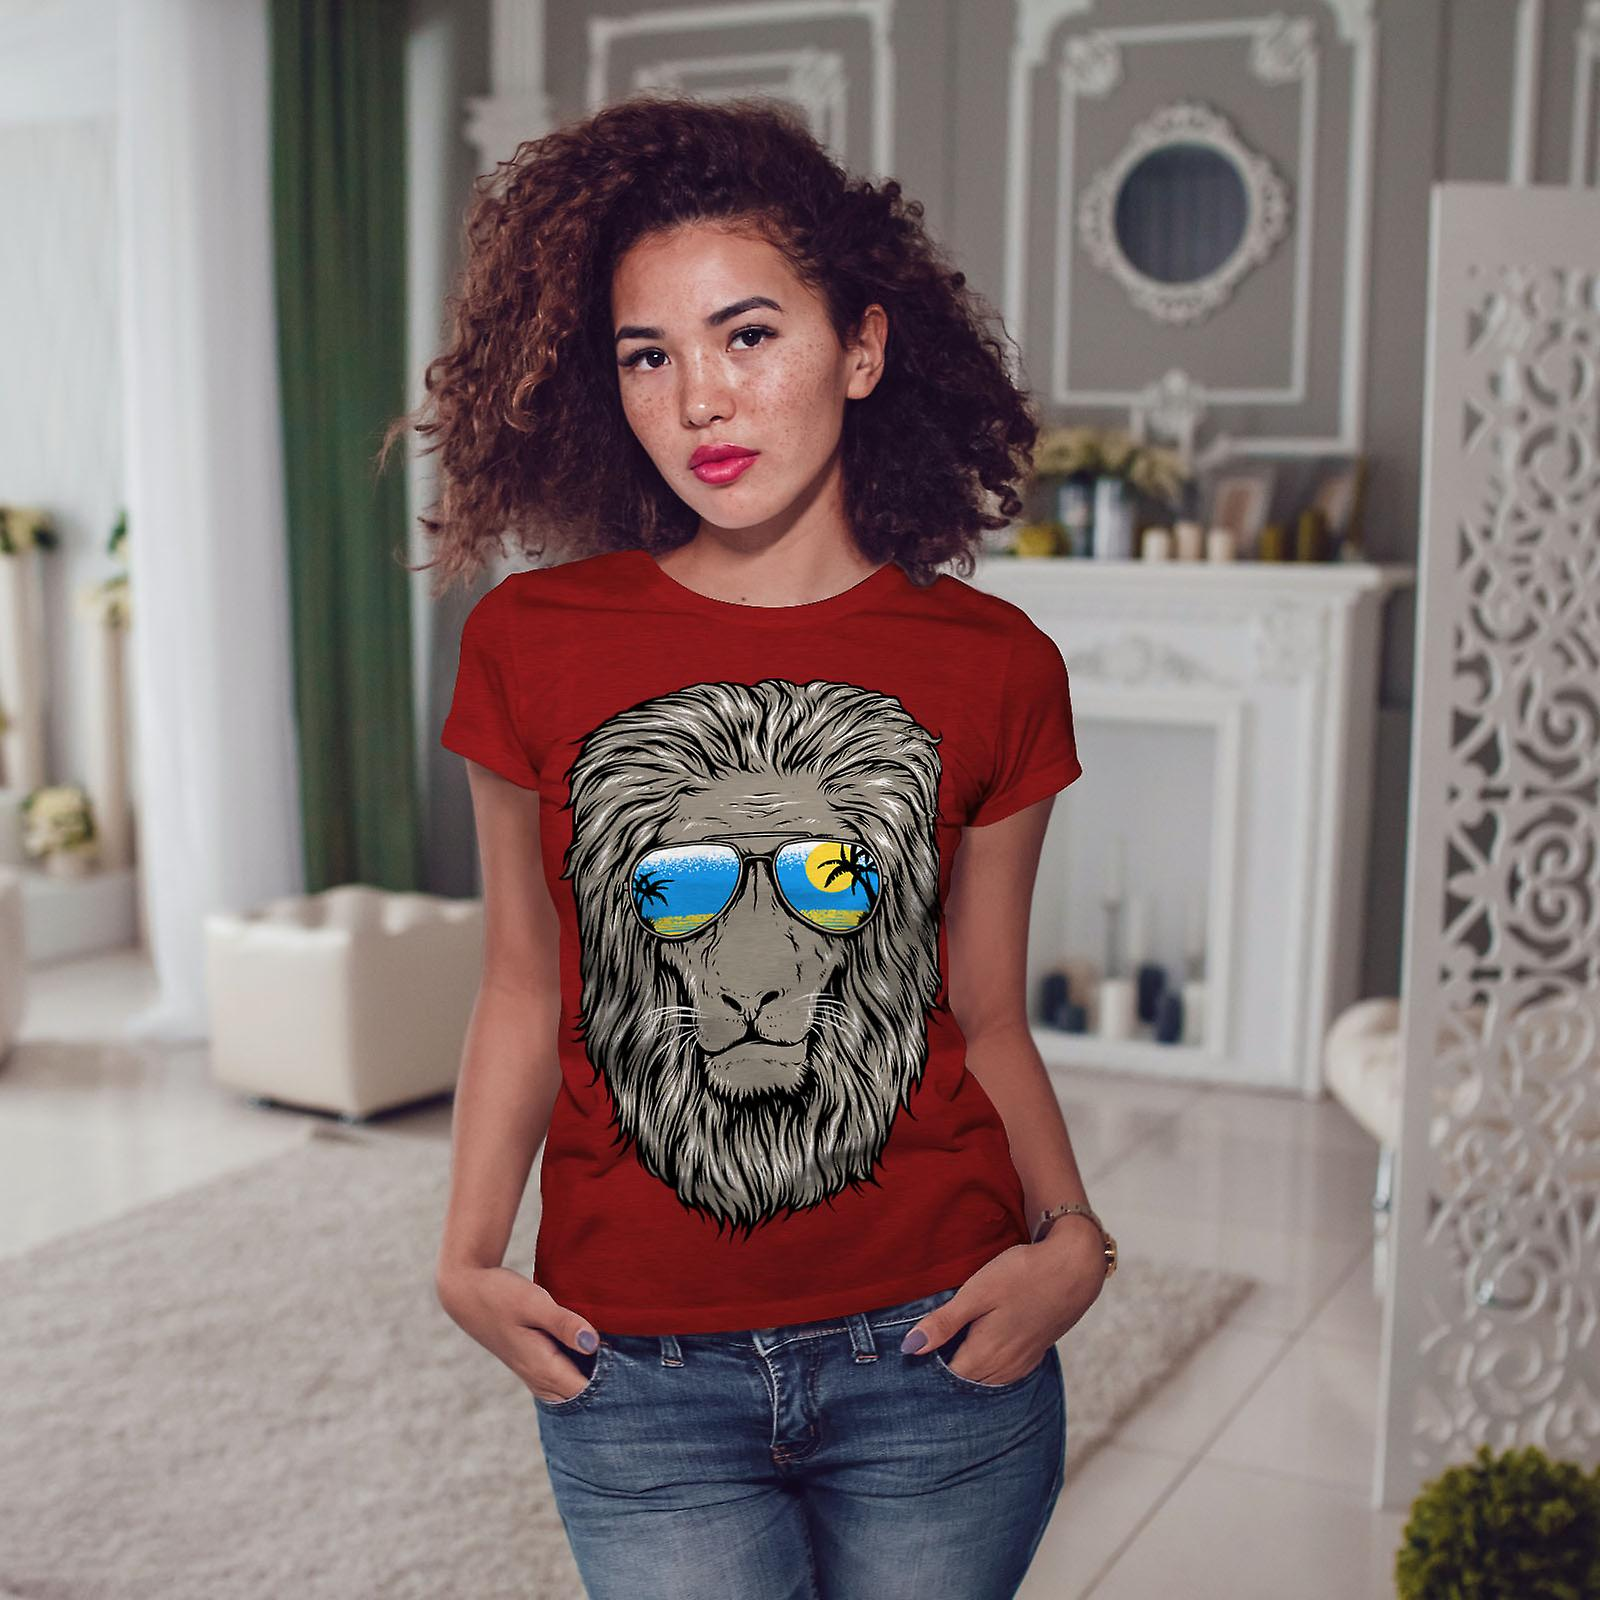 Plage de Lion soleil RedT-chemise femme | Wellcoda